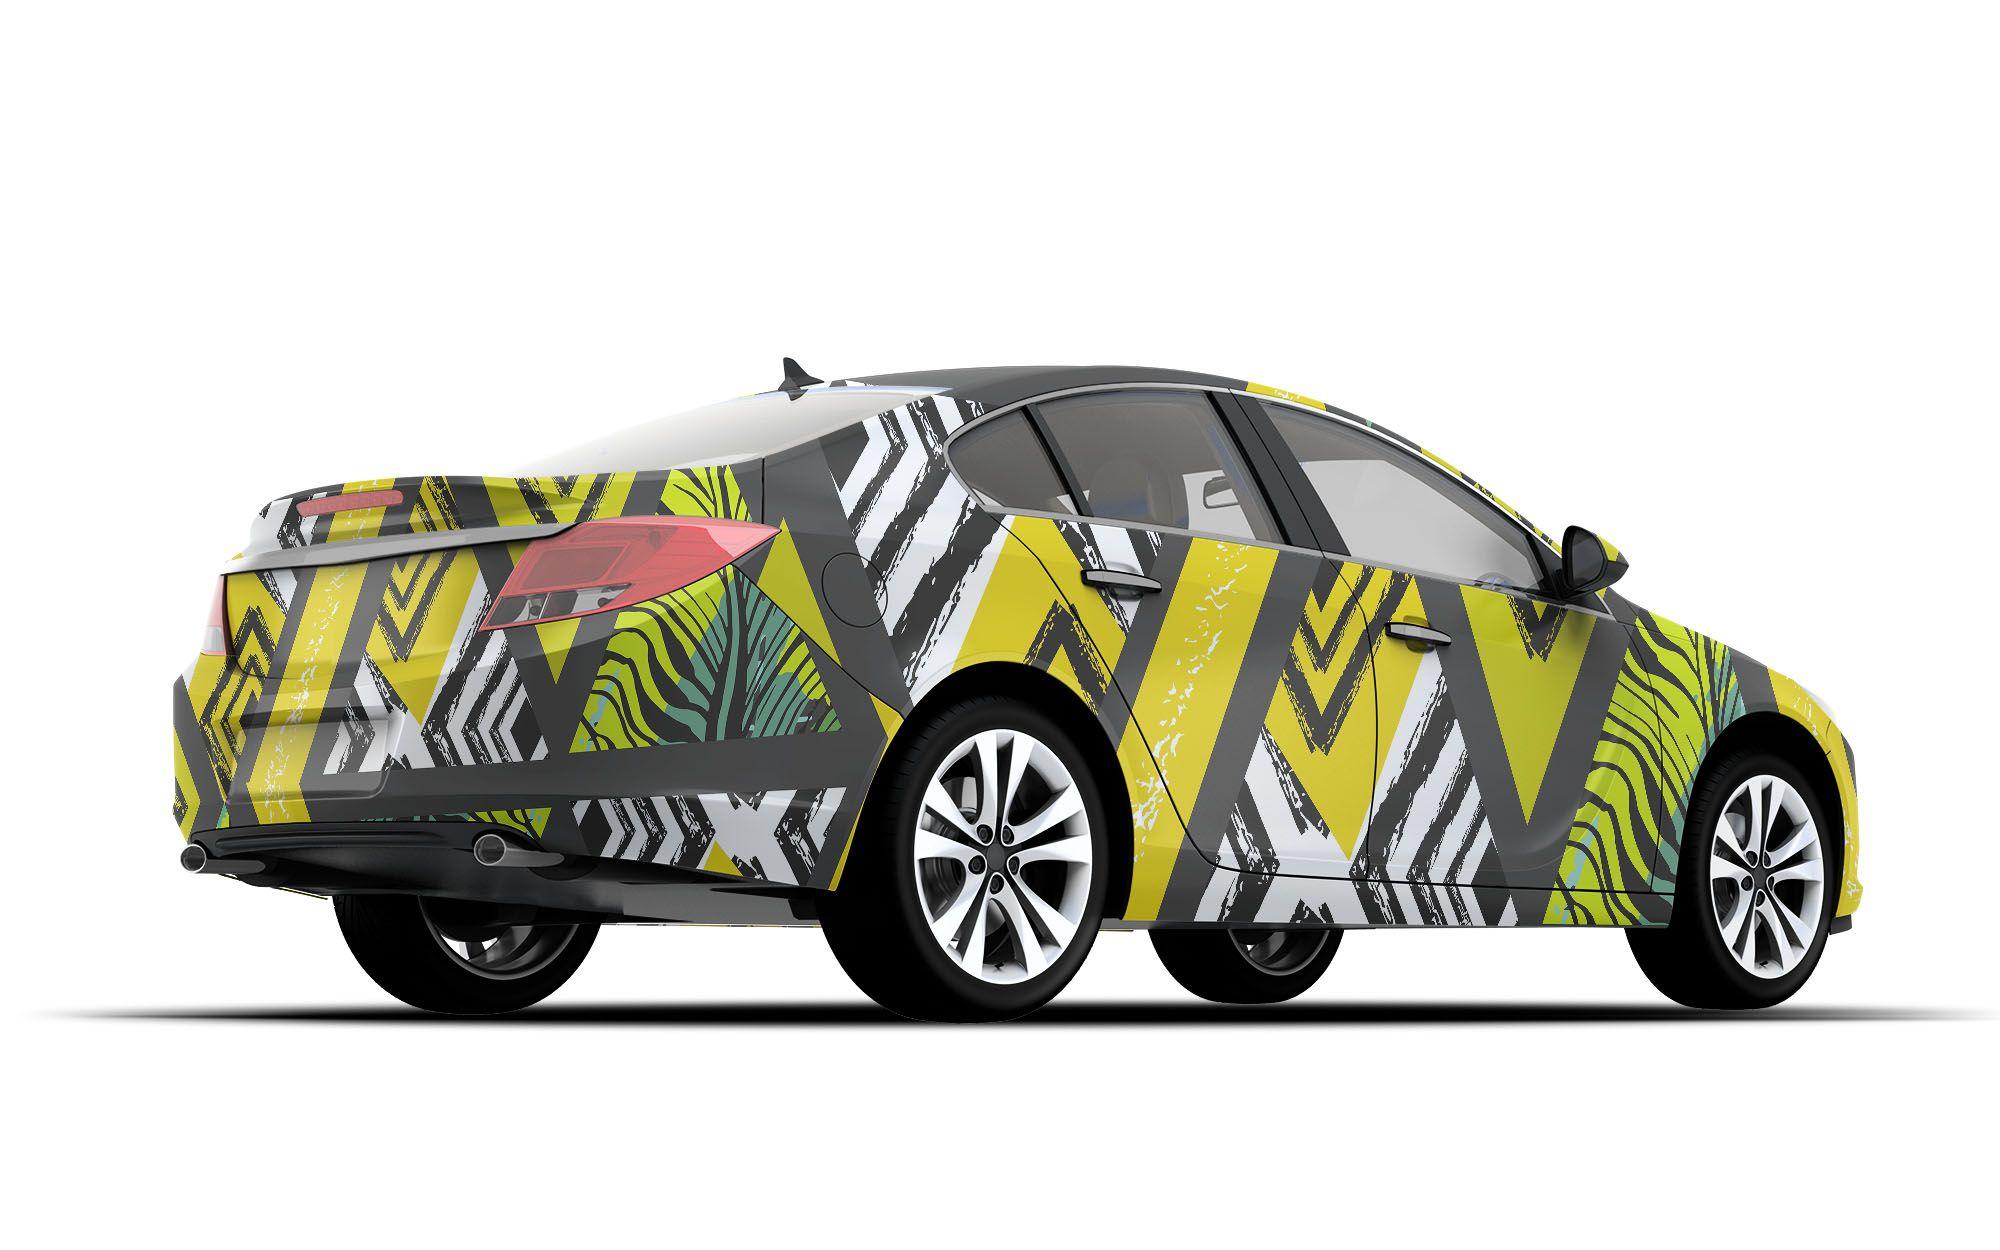 Free Download Car Wrap Design Mockup DesignMockup